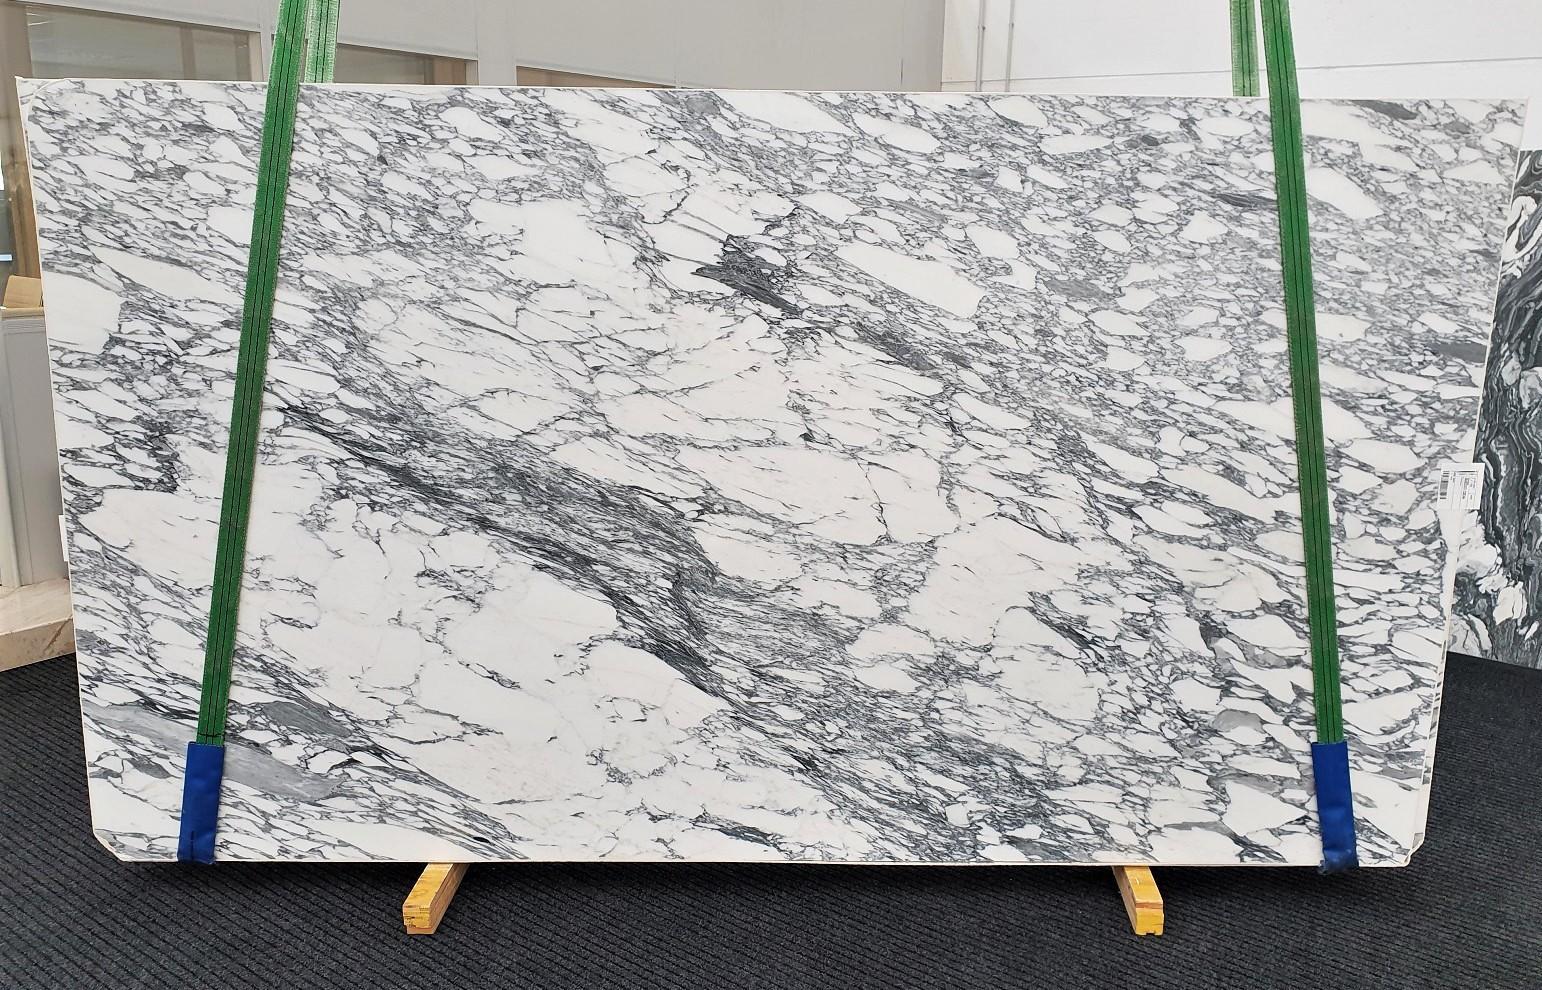 ARABESCATO CORCHIA polierte Unmaßplatten 1420 aus Natur Marmor , Slab #45: Lieferung Veneto, Italien